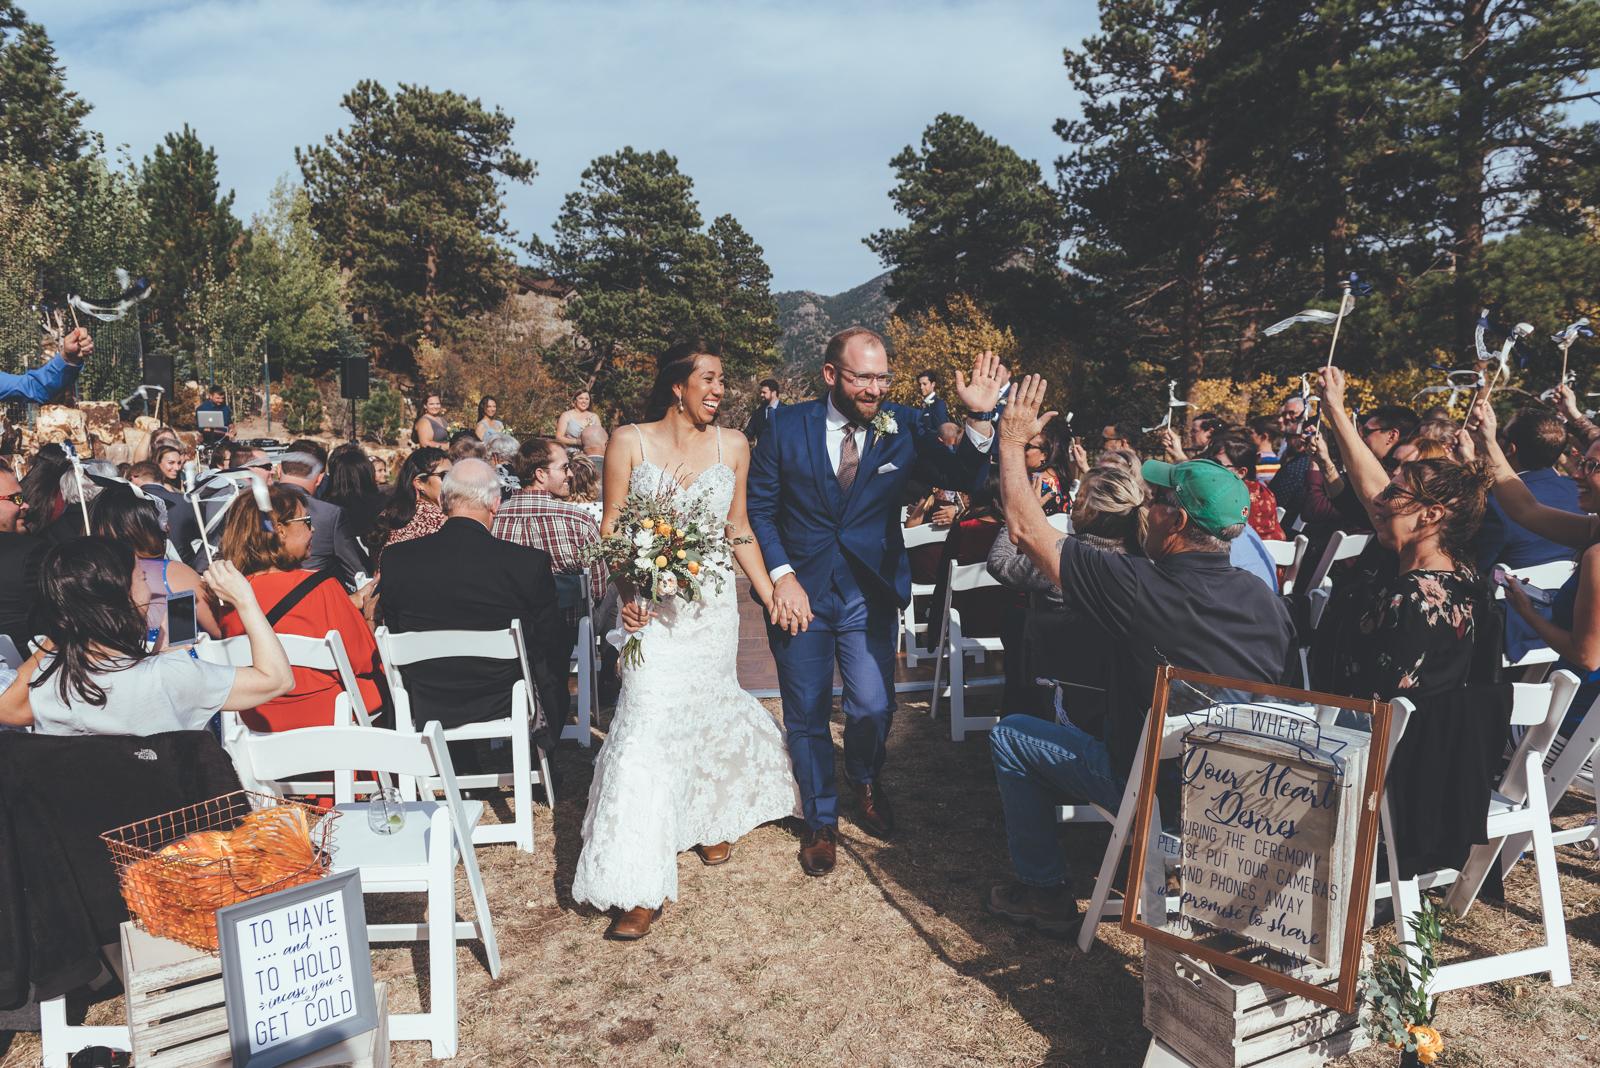 ChadFahnestockPhotography-estes-park-wedding-photography-028.jpg